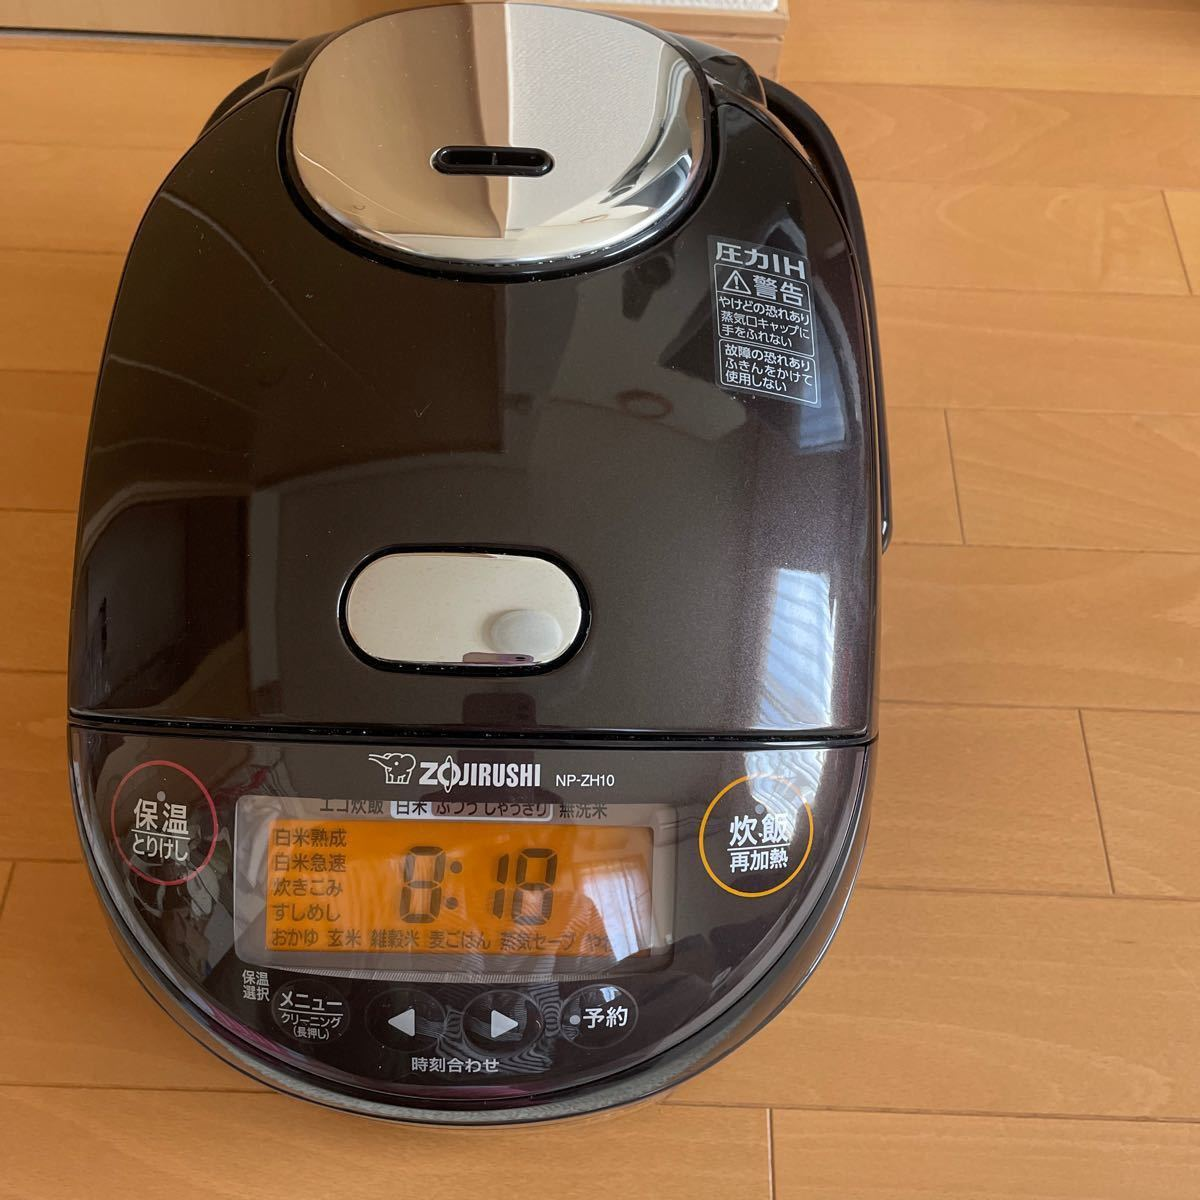 象印圧力IH炊飯器5.5合炊き